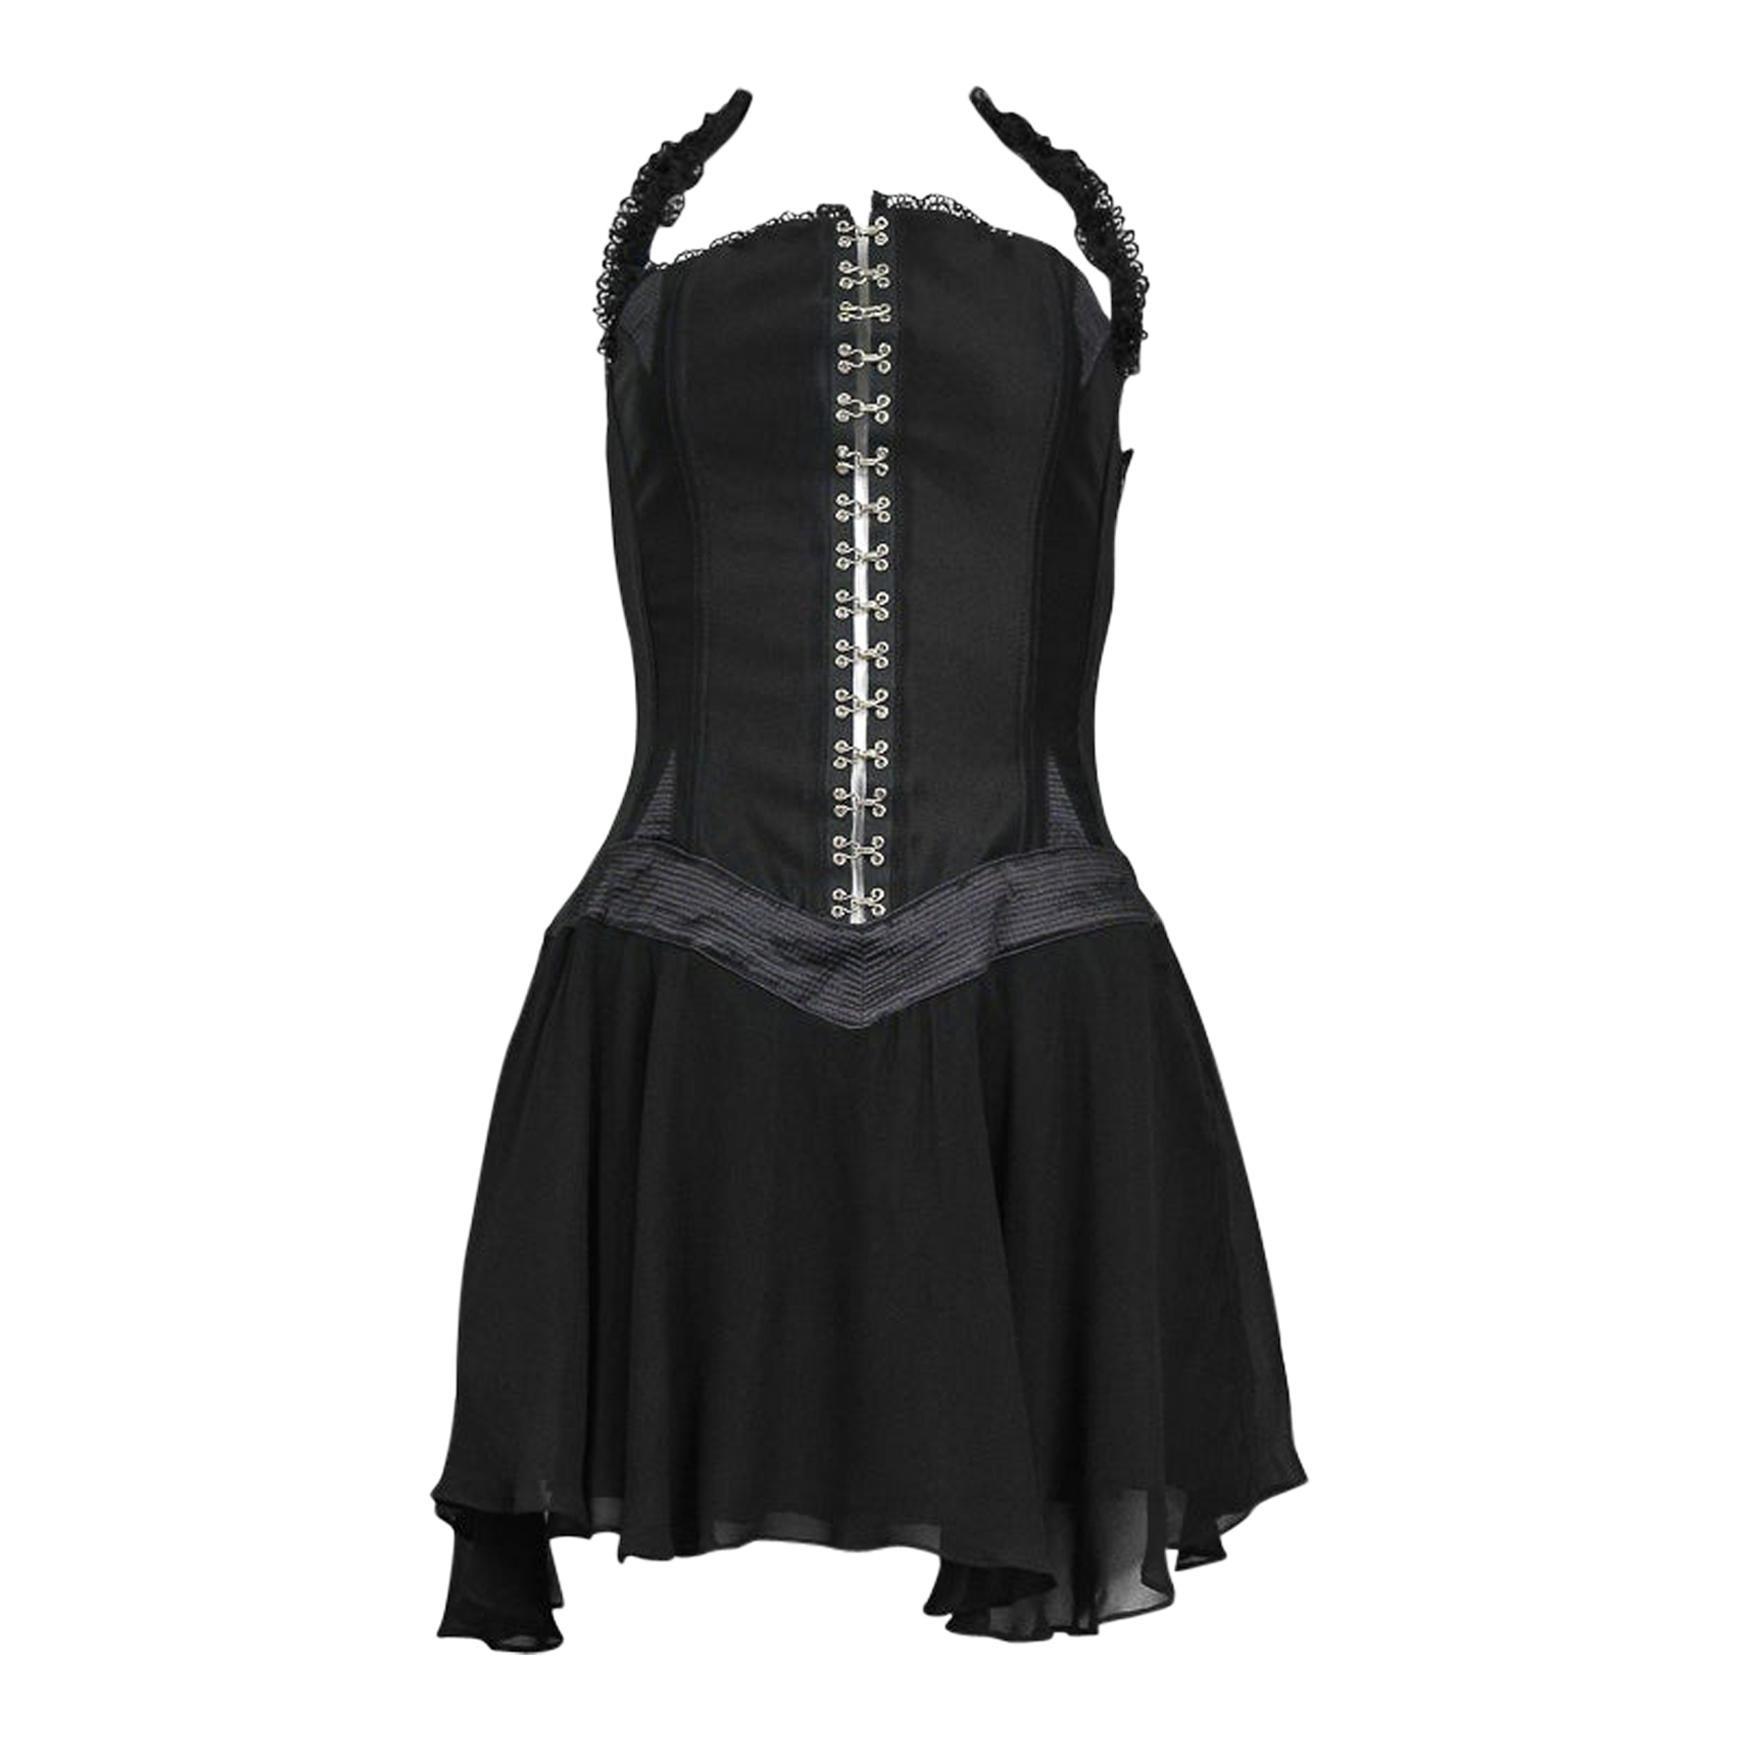 Vintage Gianni Versace Black Corset Dress 1995